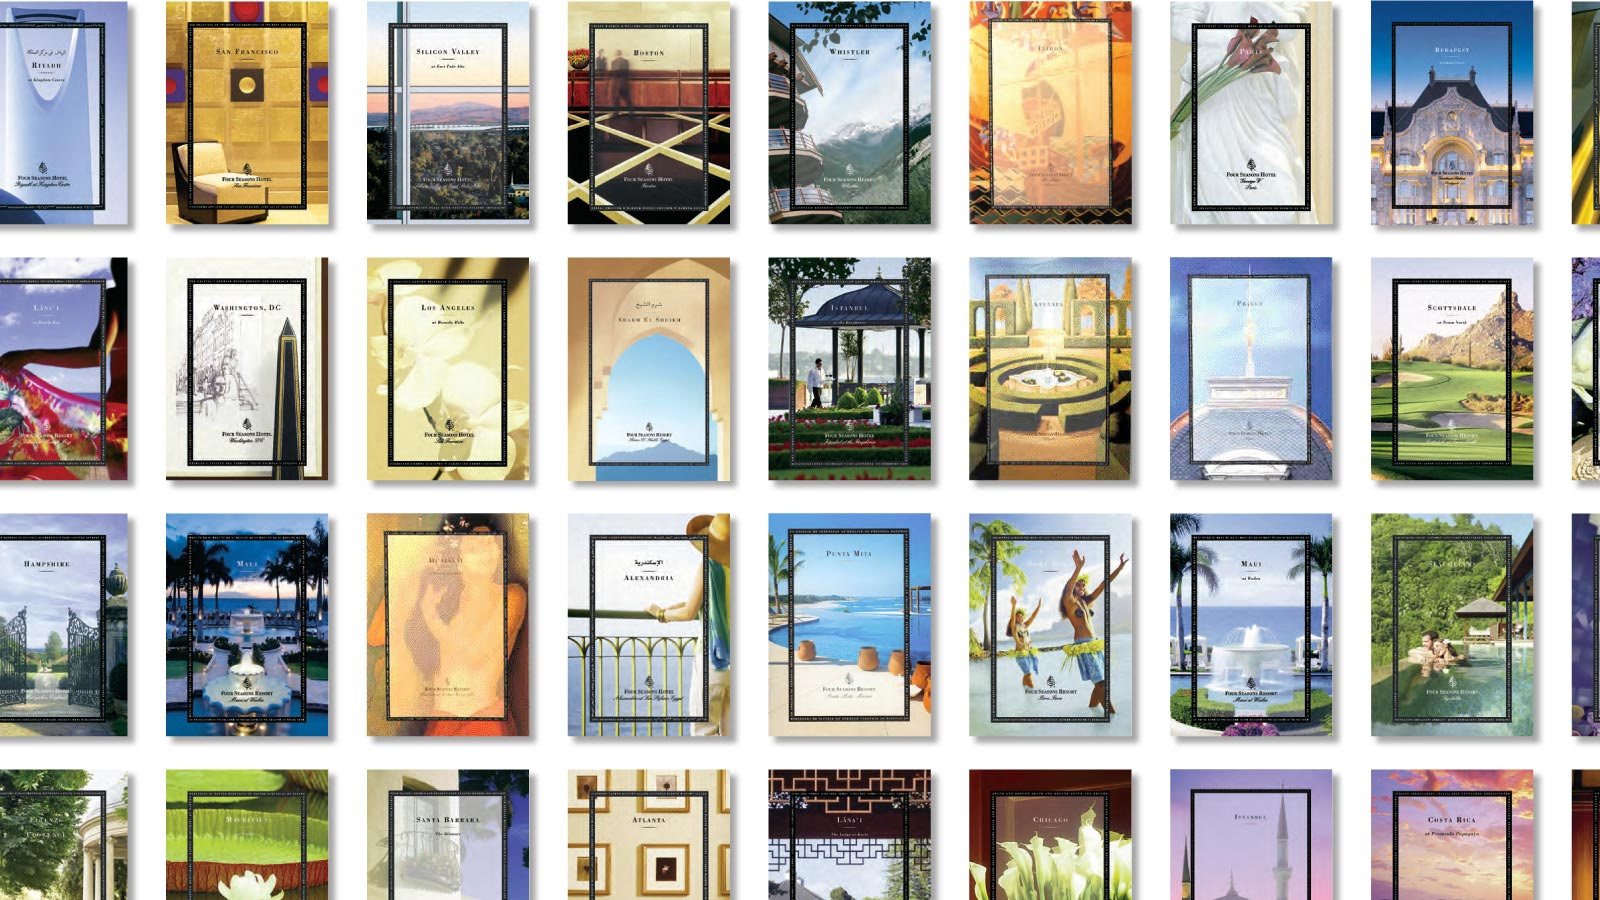 Four Seasons Hotels & Resorts | Brand Identity | Design